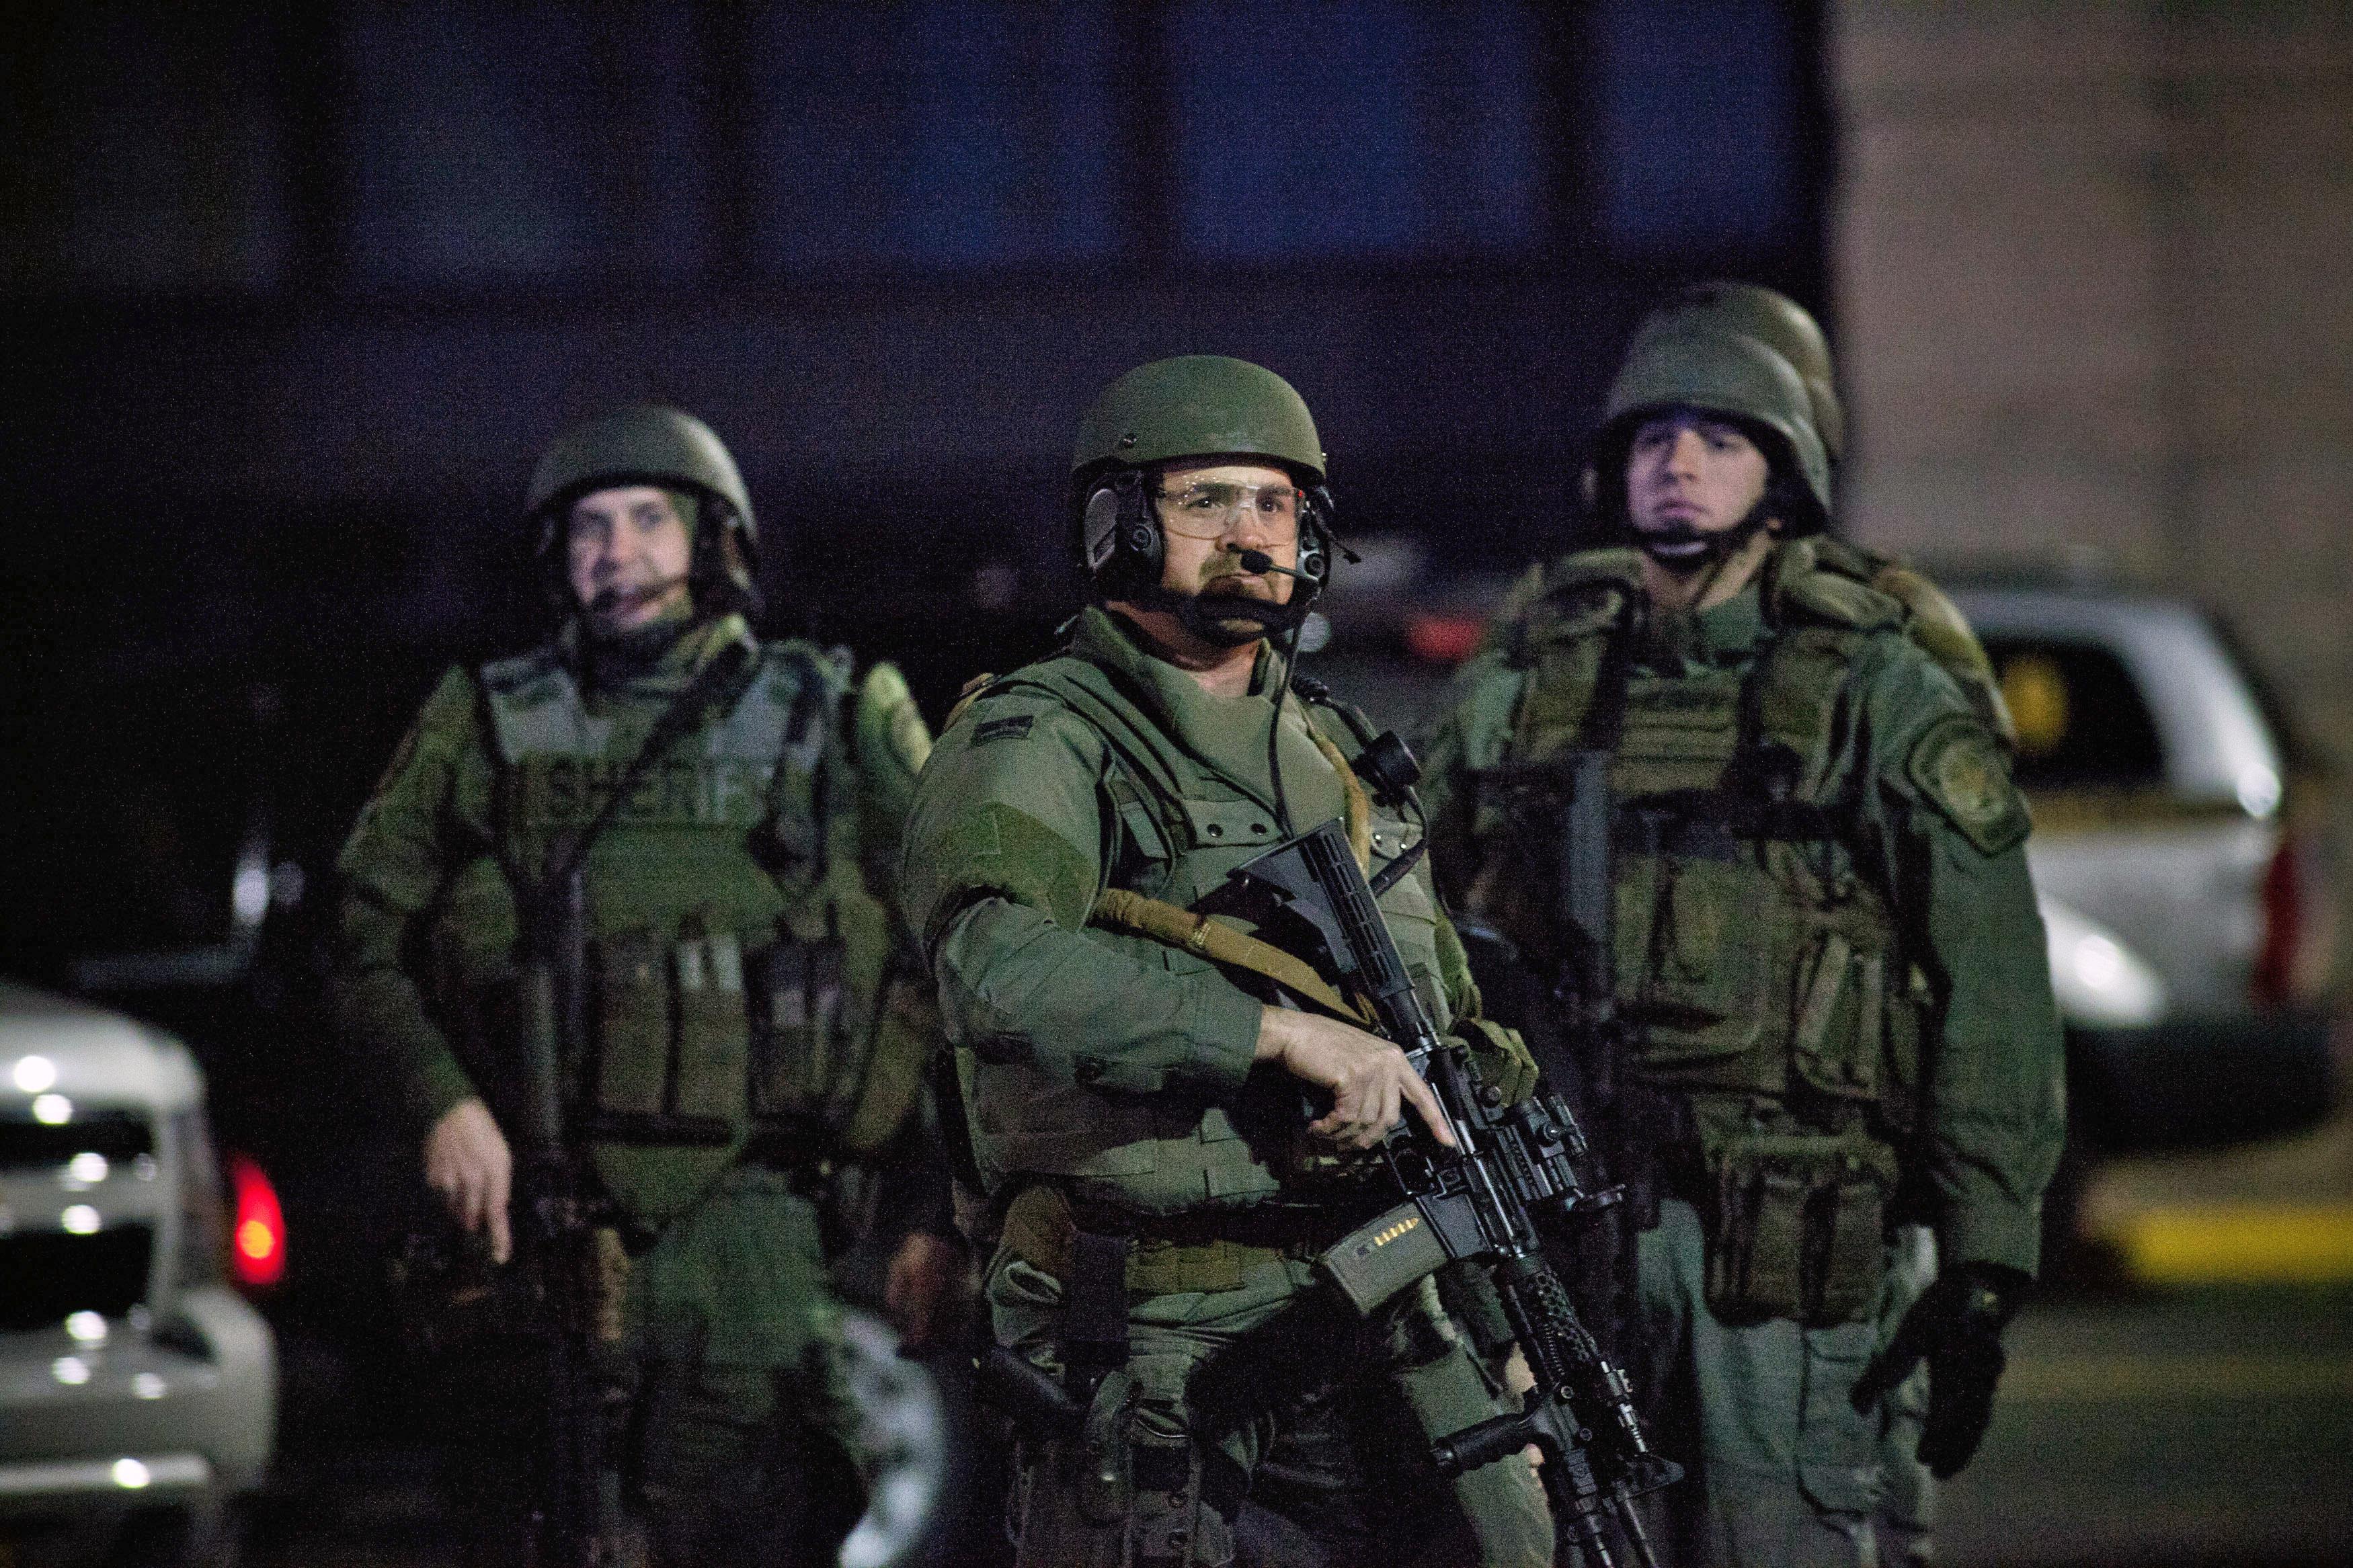 Paramus Mall Shooting Ricarhd Shoop 20 Found Dead Of Self Inflicted Gunshot Inside Westfield Garden State Plaza